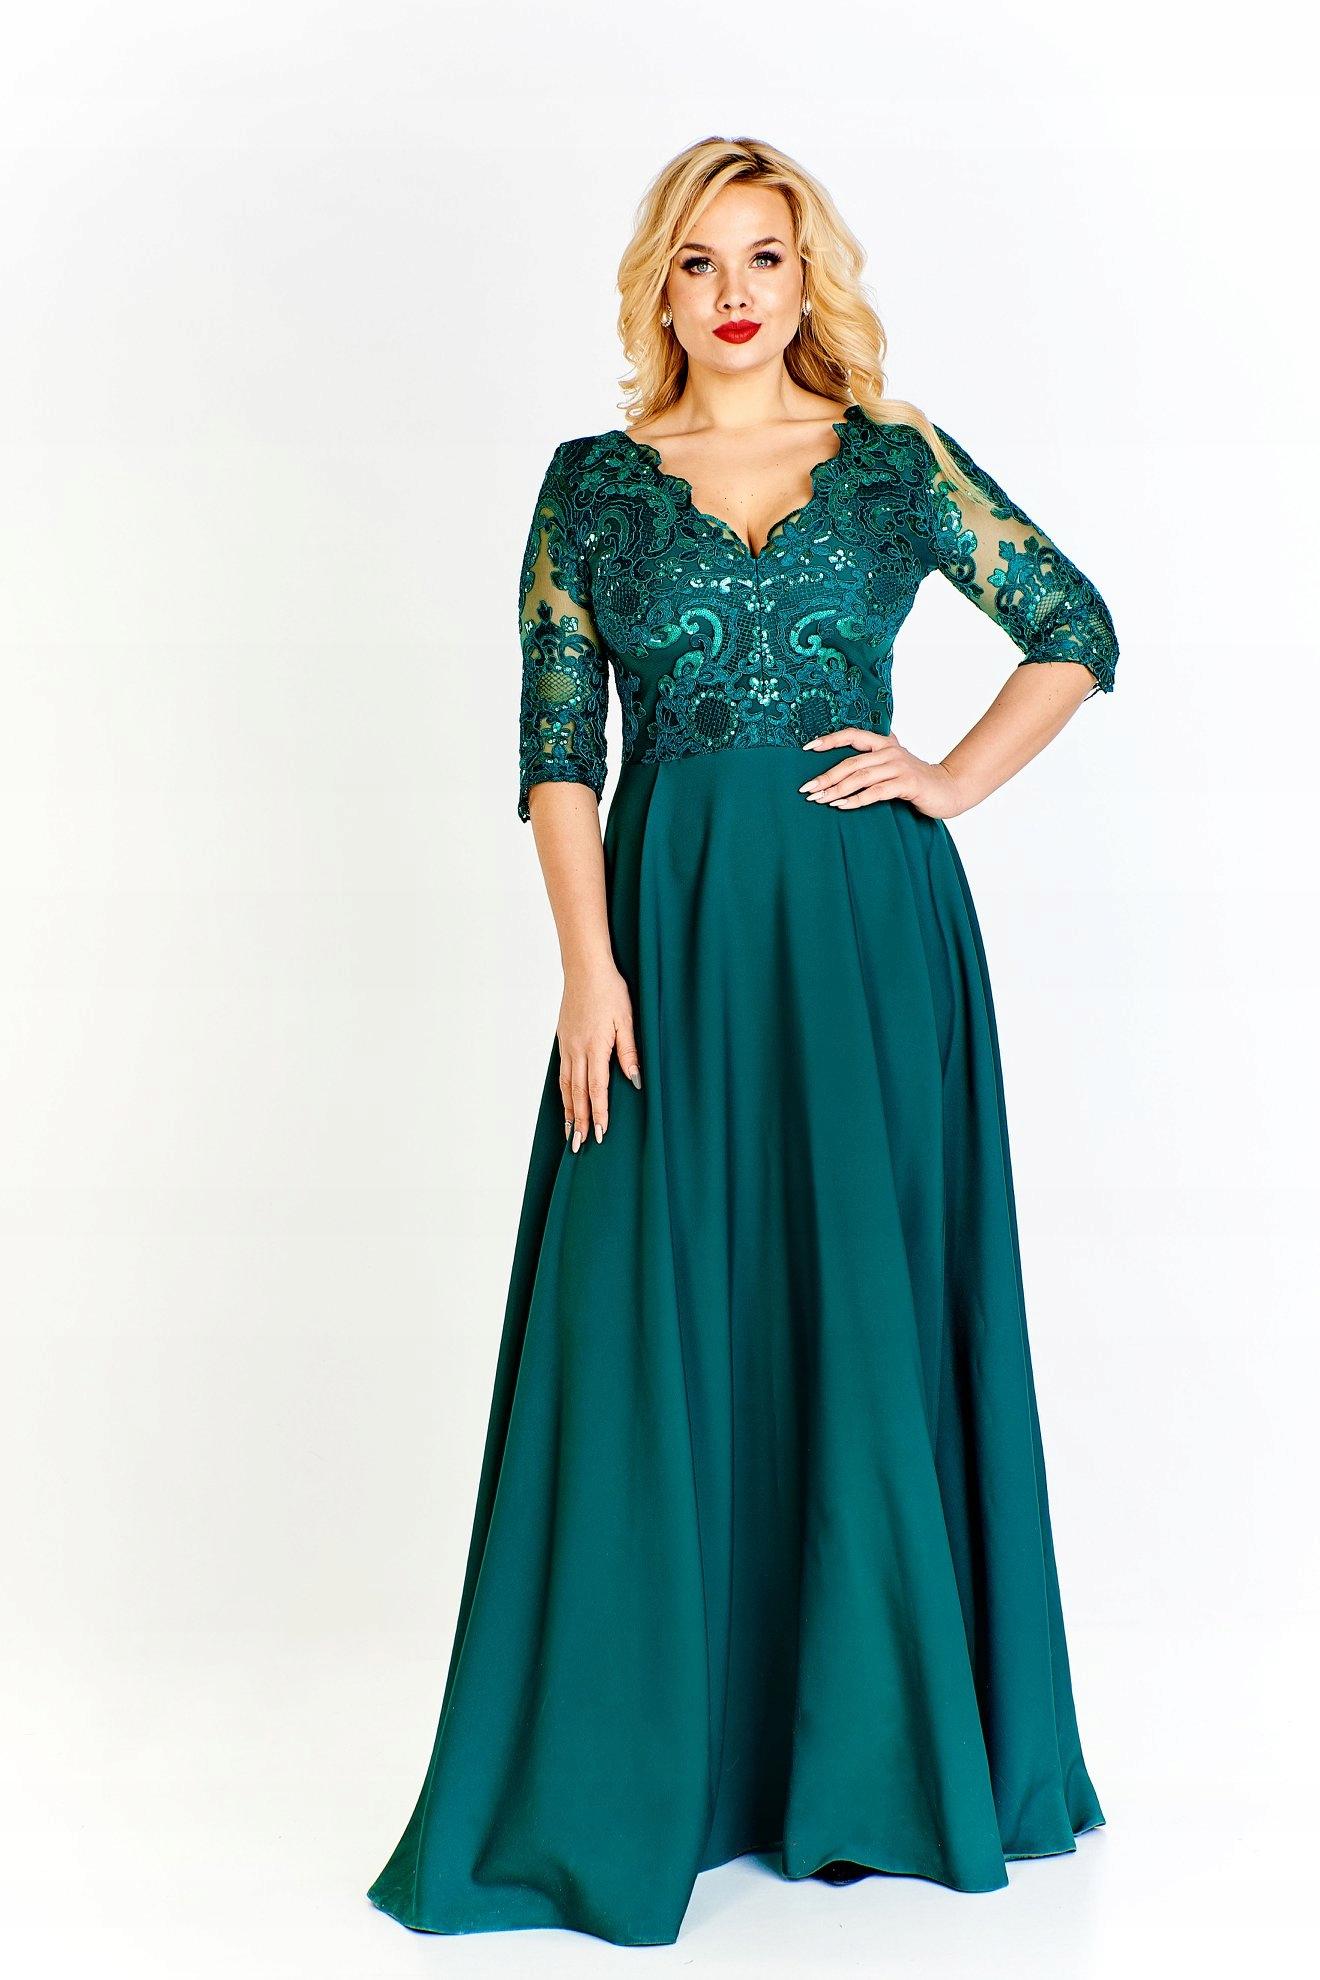 9f2cc67710 Sukienka elegancka długa 40 studniówka sylwester - 7716241968 ...